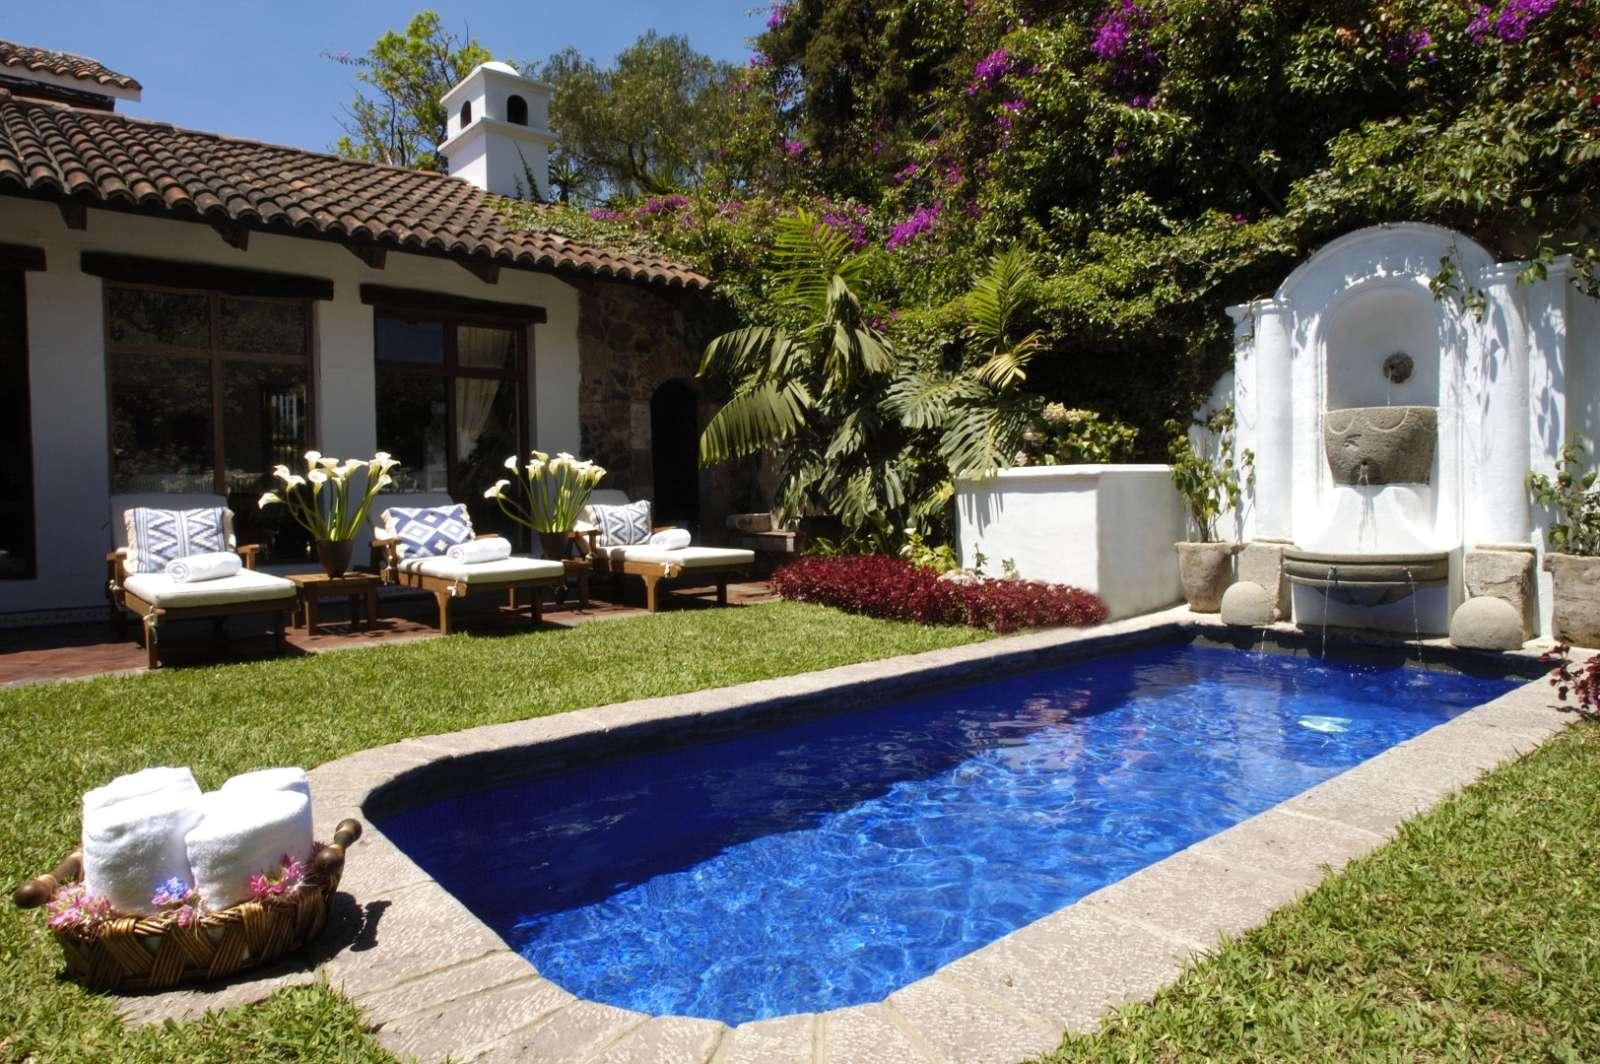 Pool at Casa Encantada in Antigua